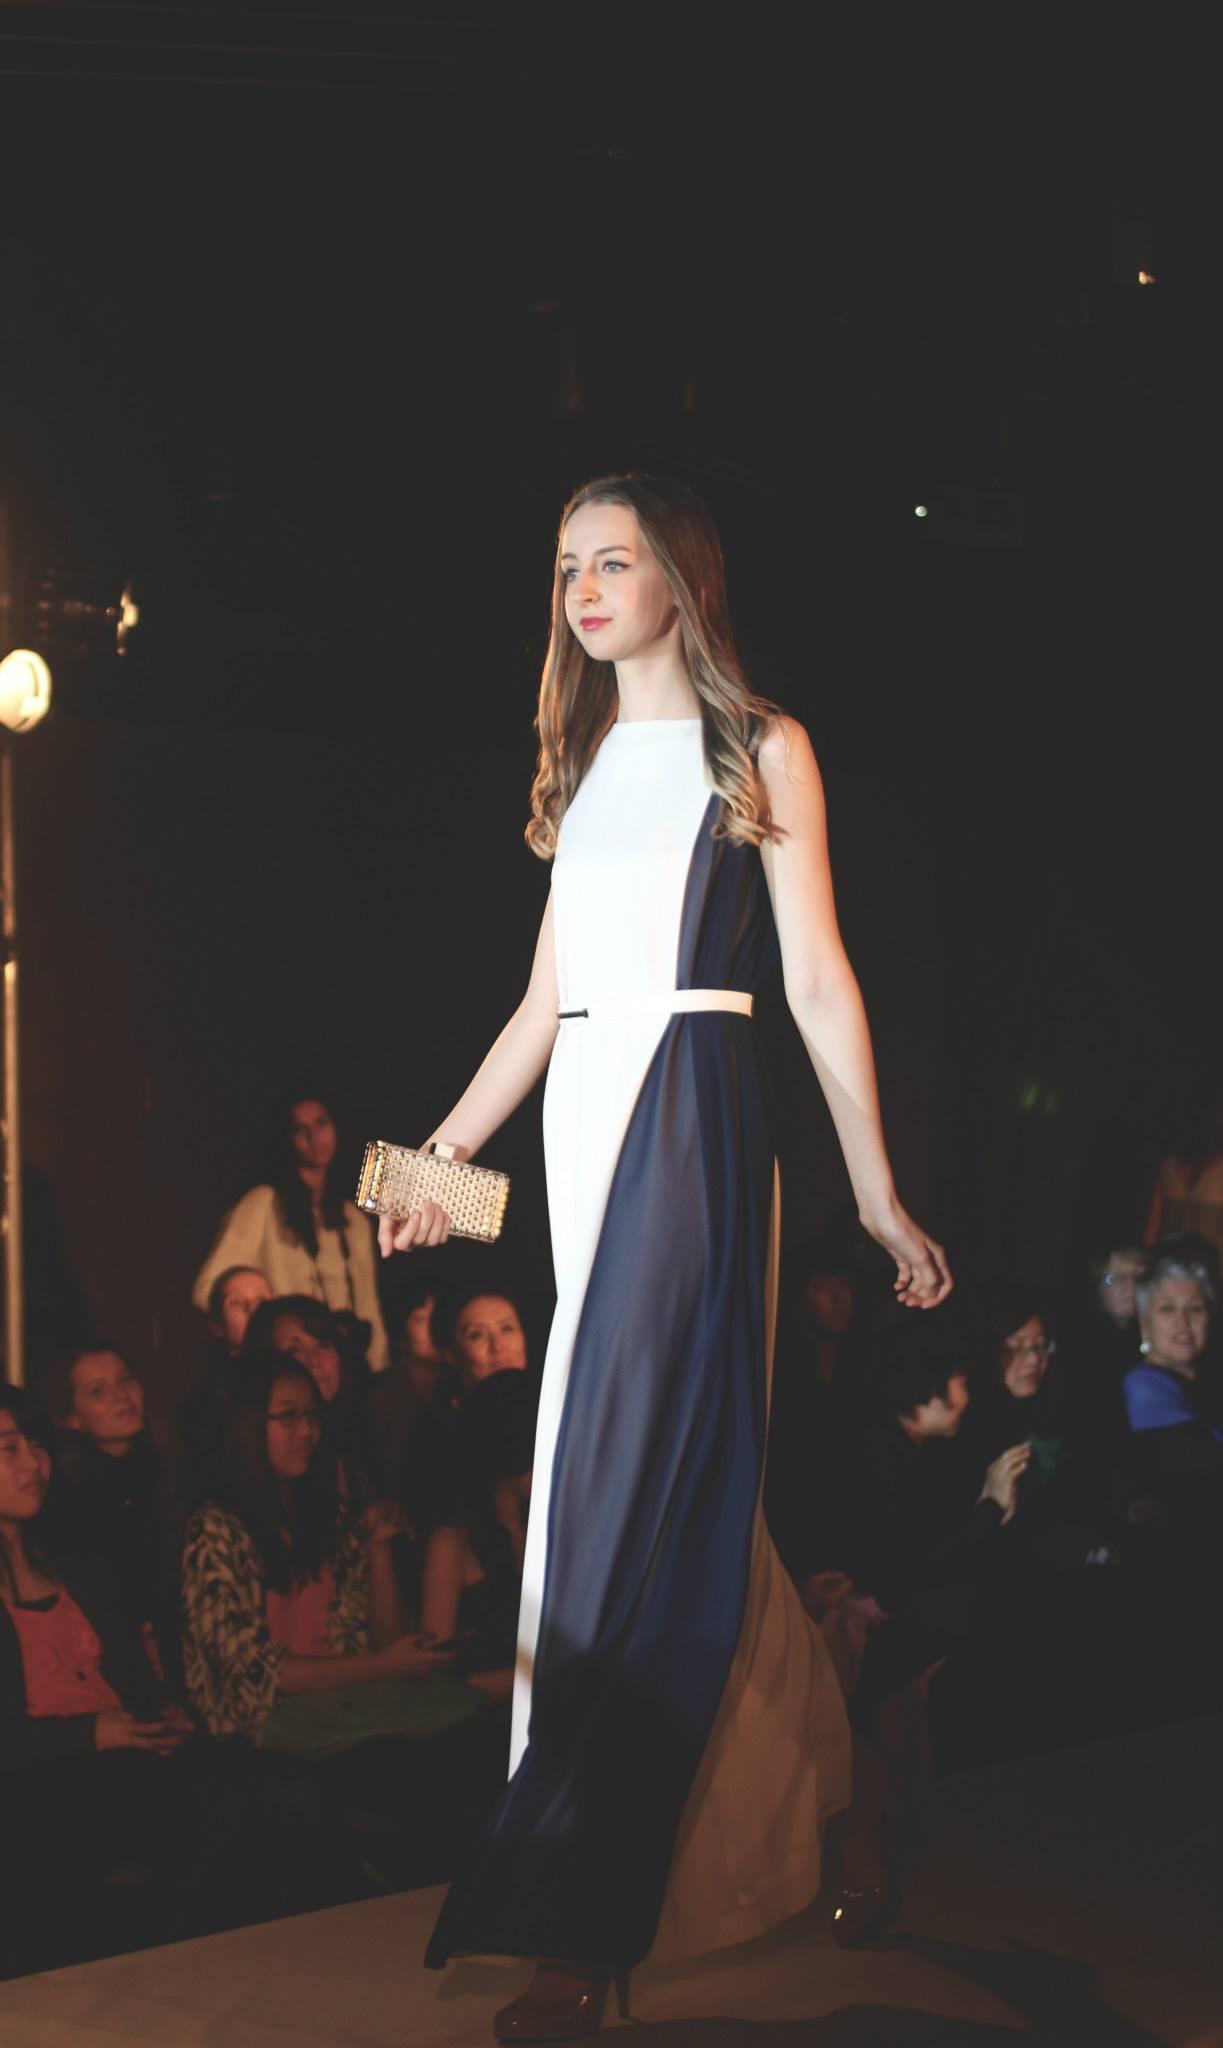 Model: Kayla | Photography: Kasia Cheng